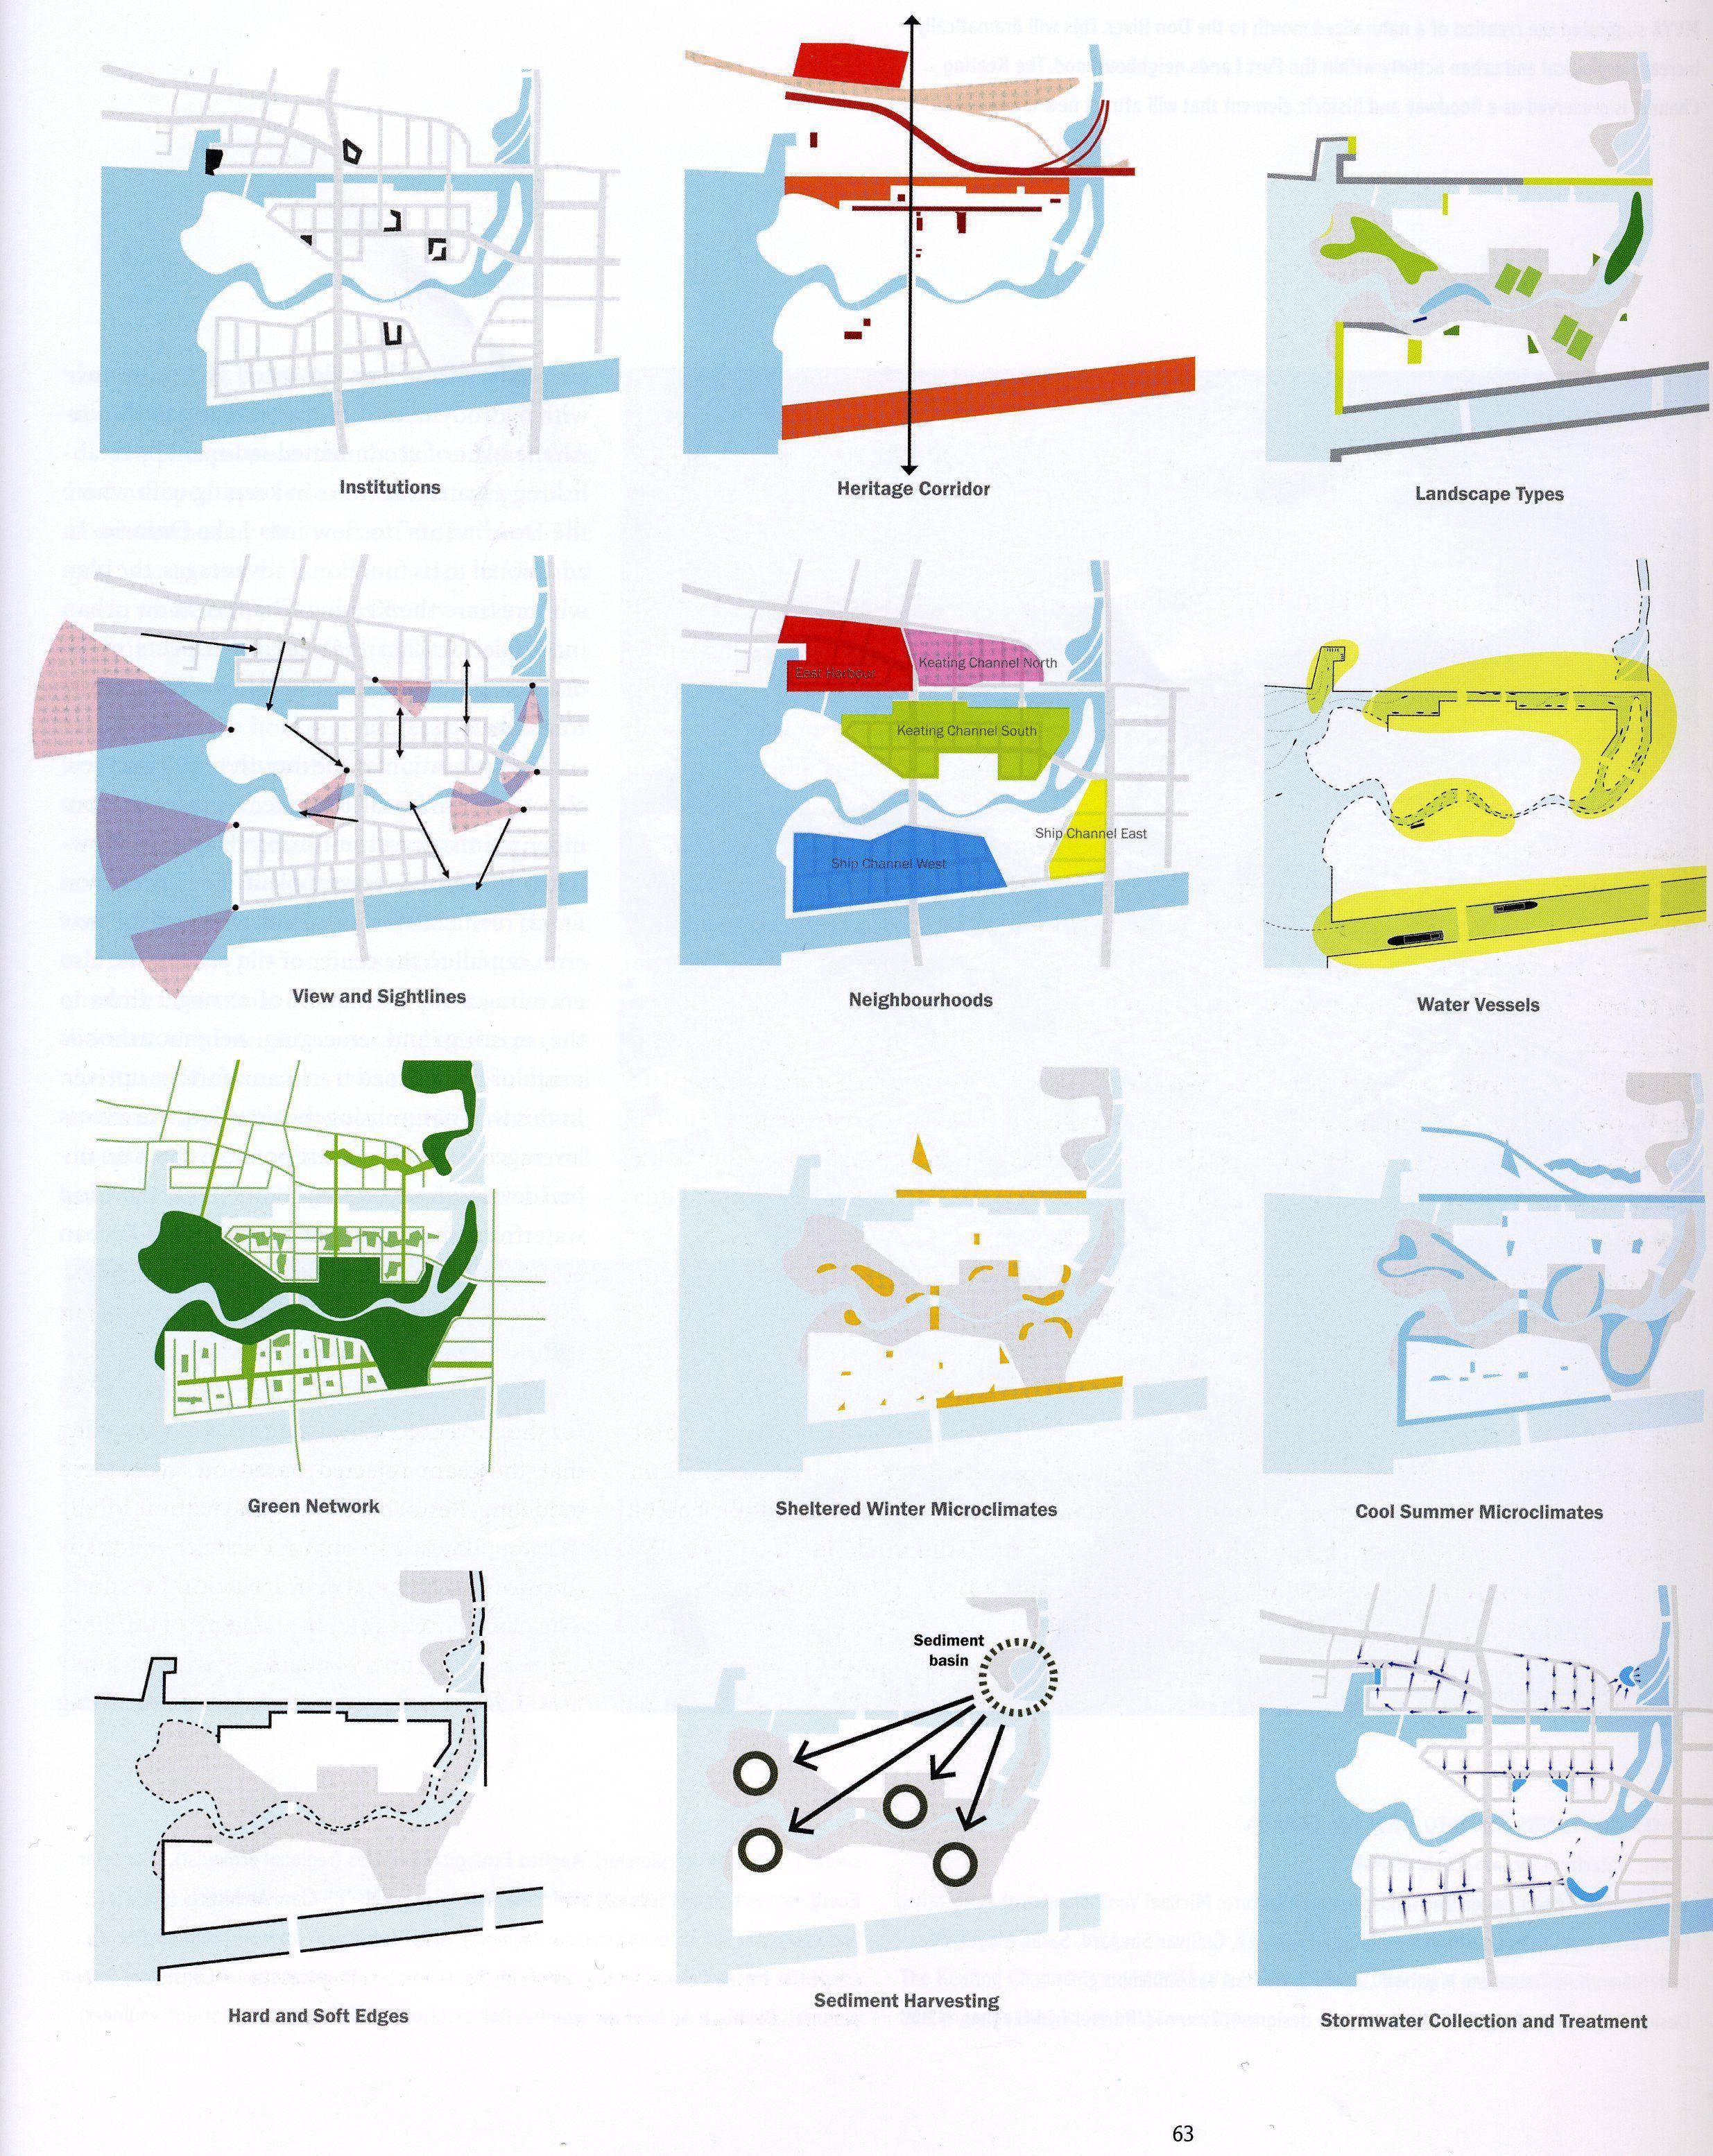 Pin By 宓琦 王 On D Landscape Diagram Urban Design Graphics Urban Design Diagram